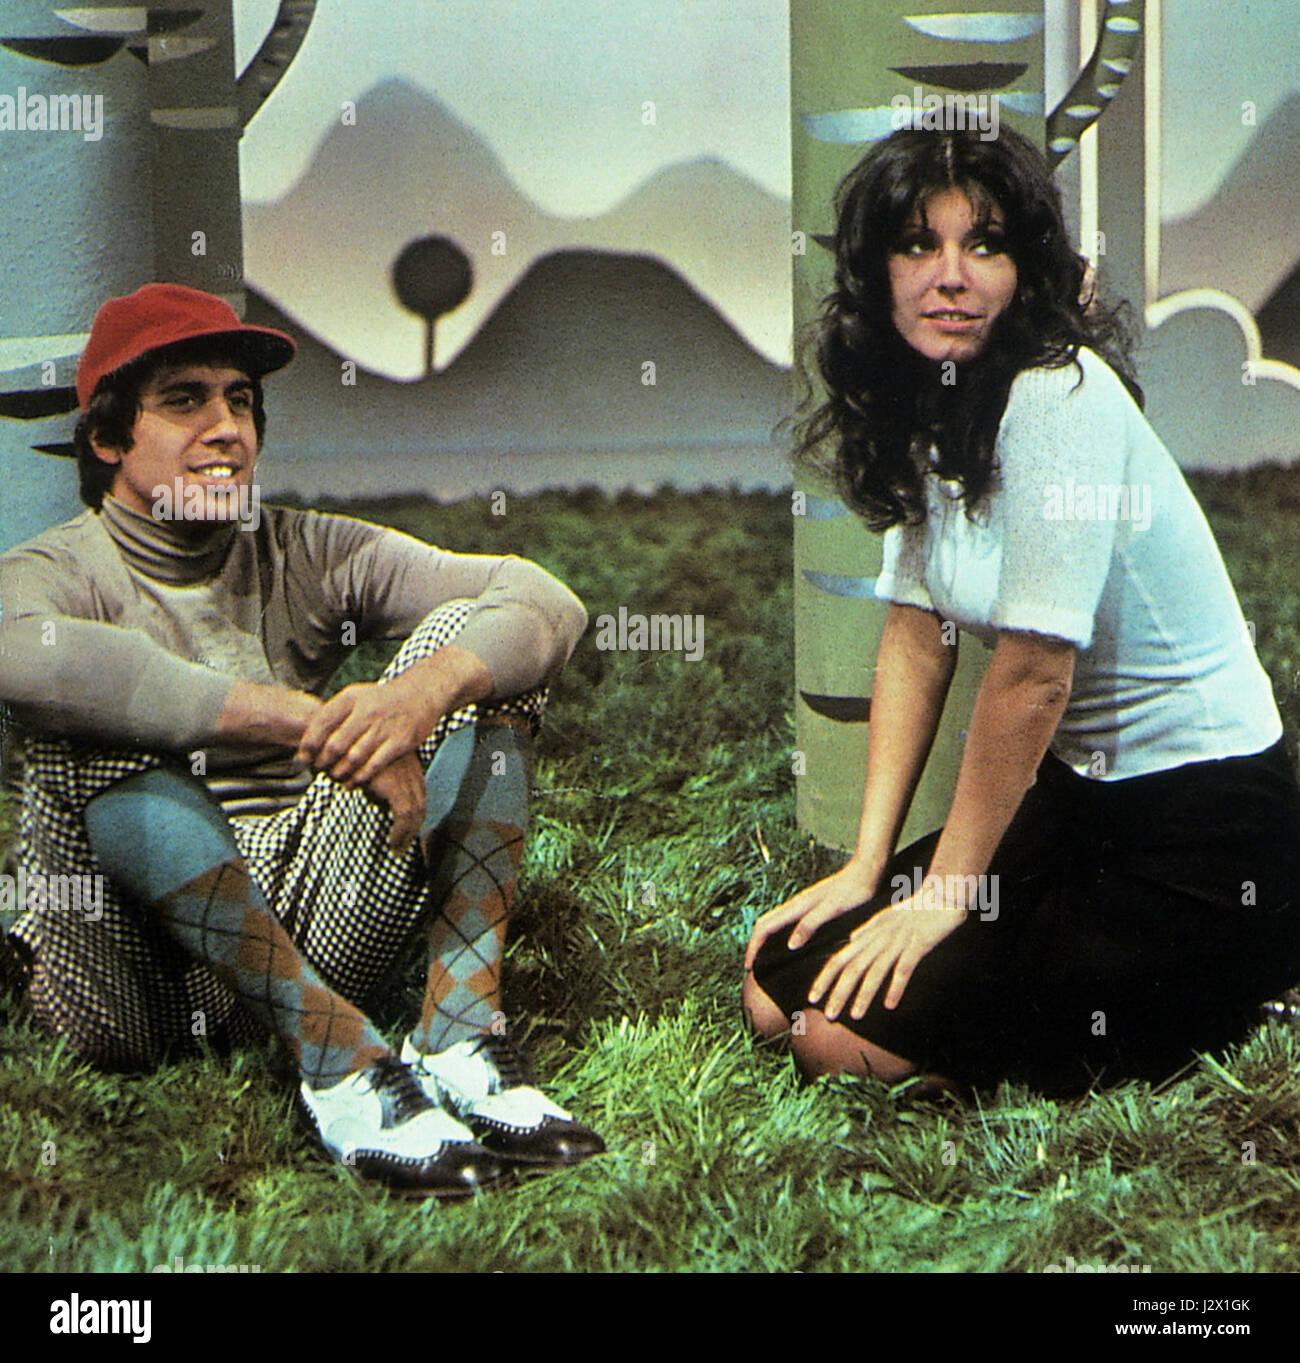 Adriano Celentano and Claudia Mori 72 - Stock Image